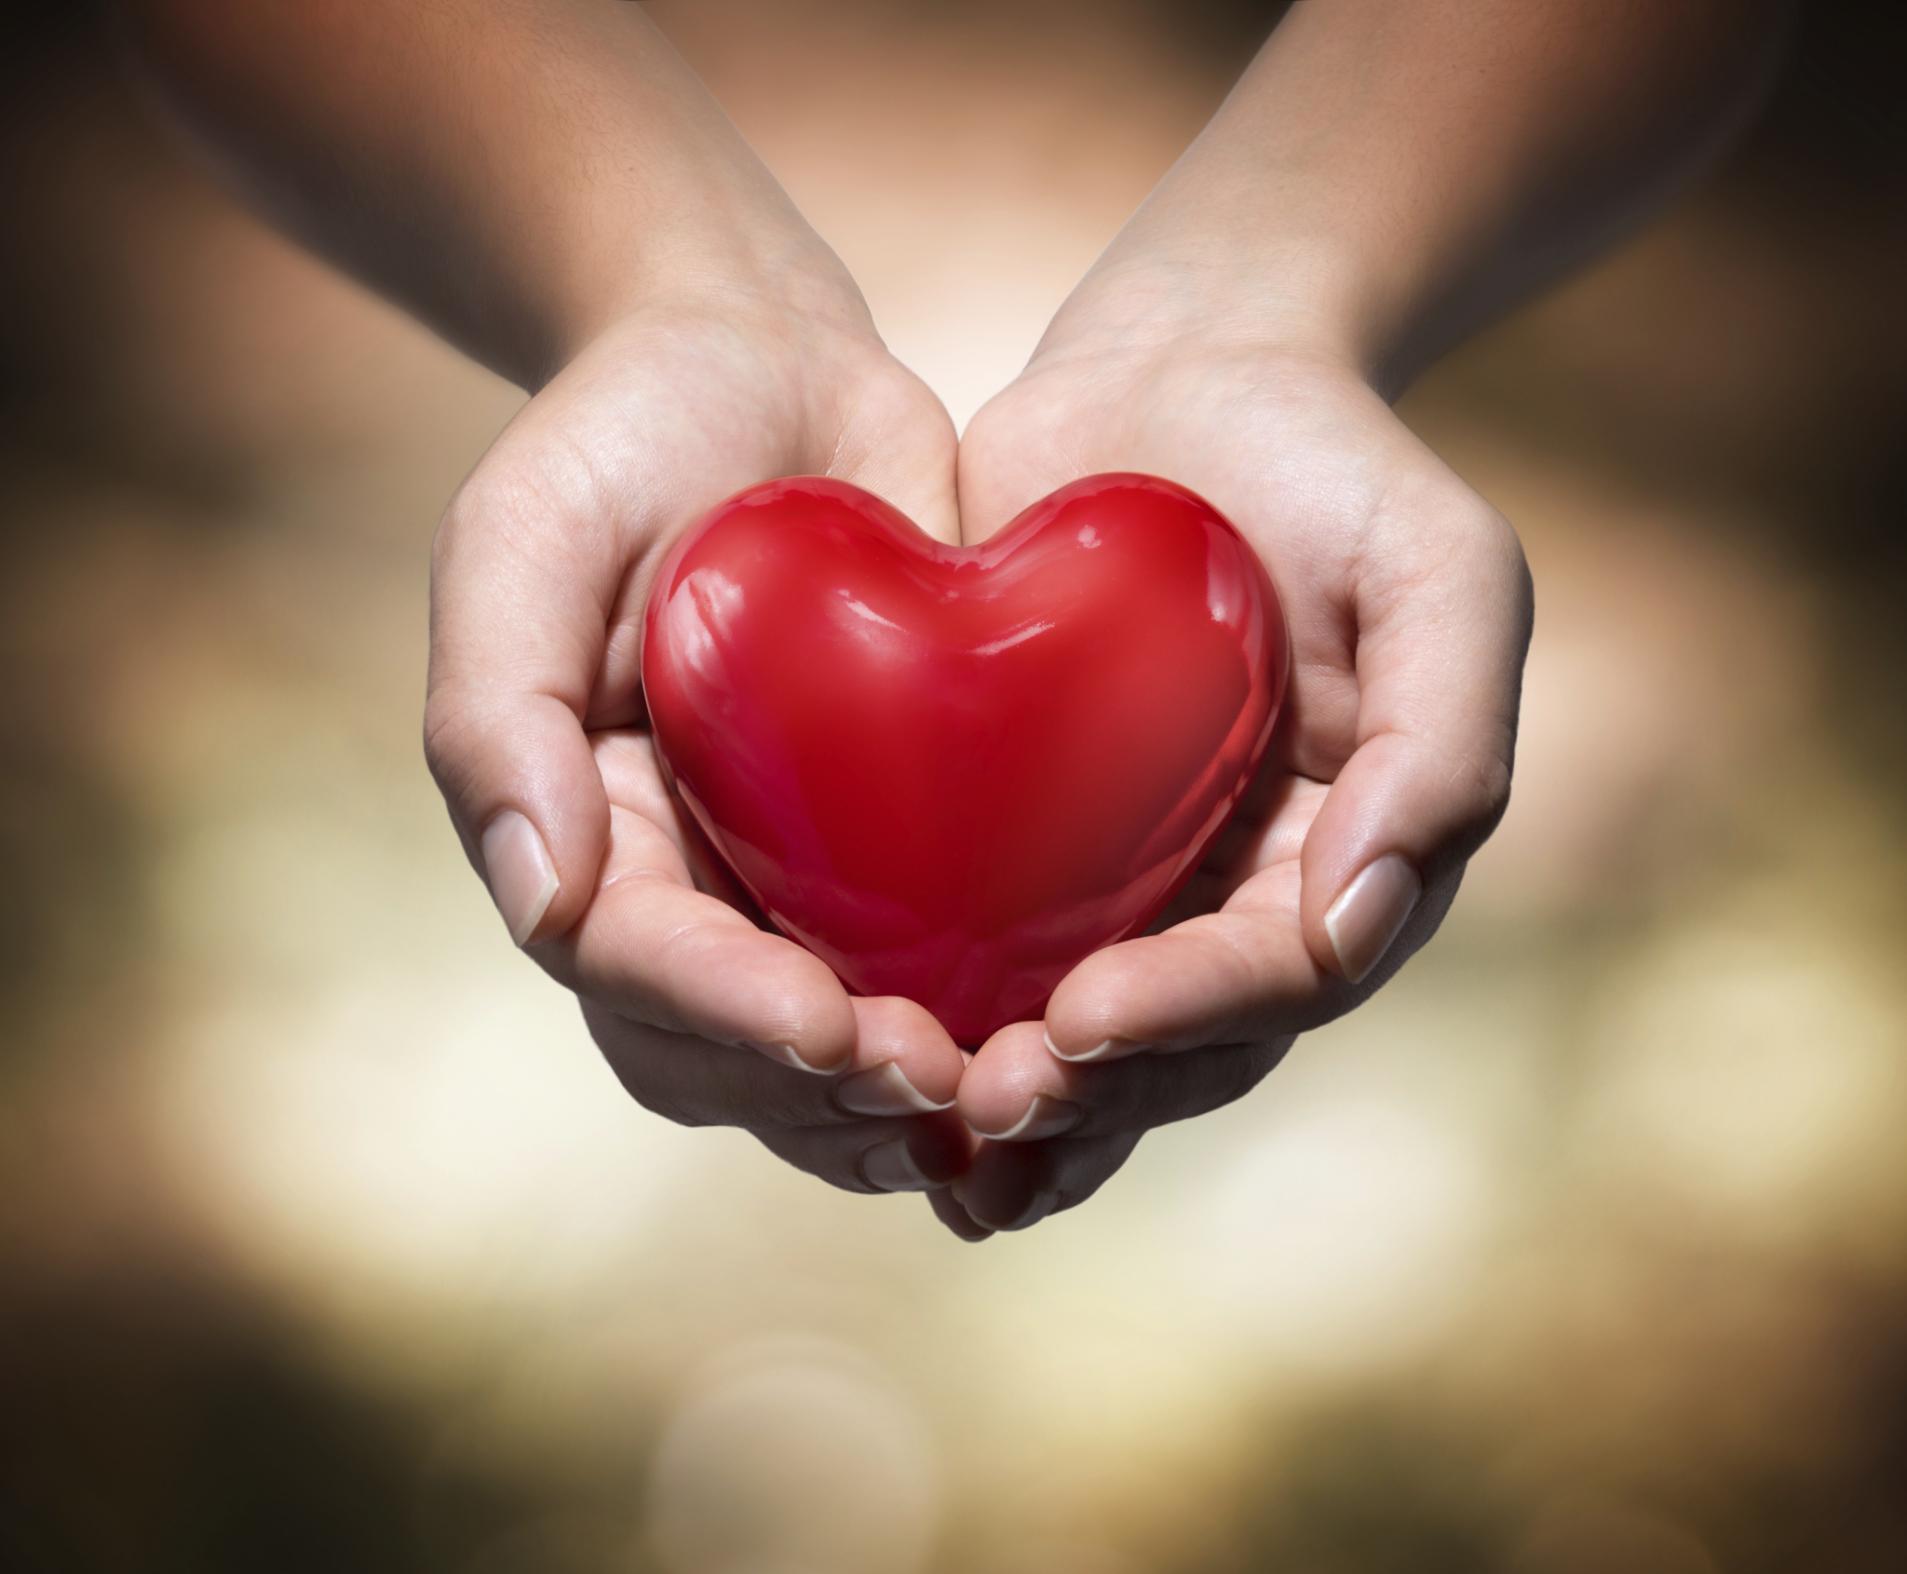 Hand holding a heart bobble.